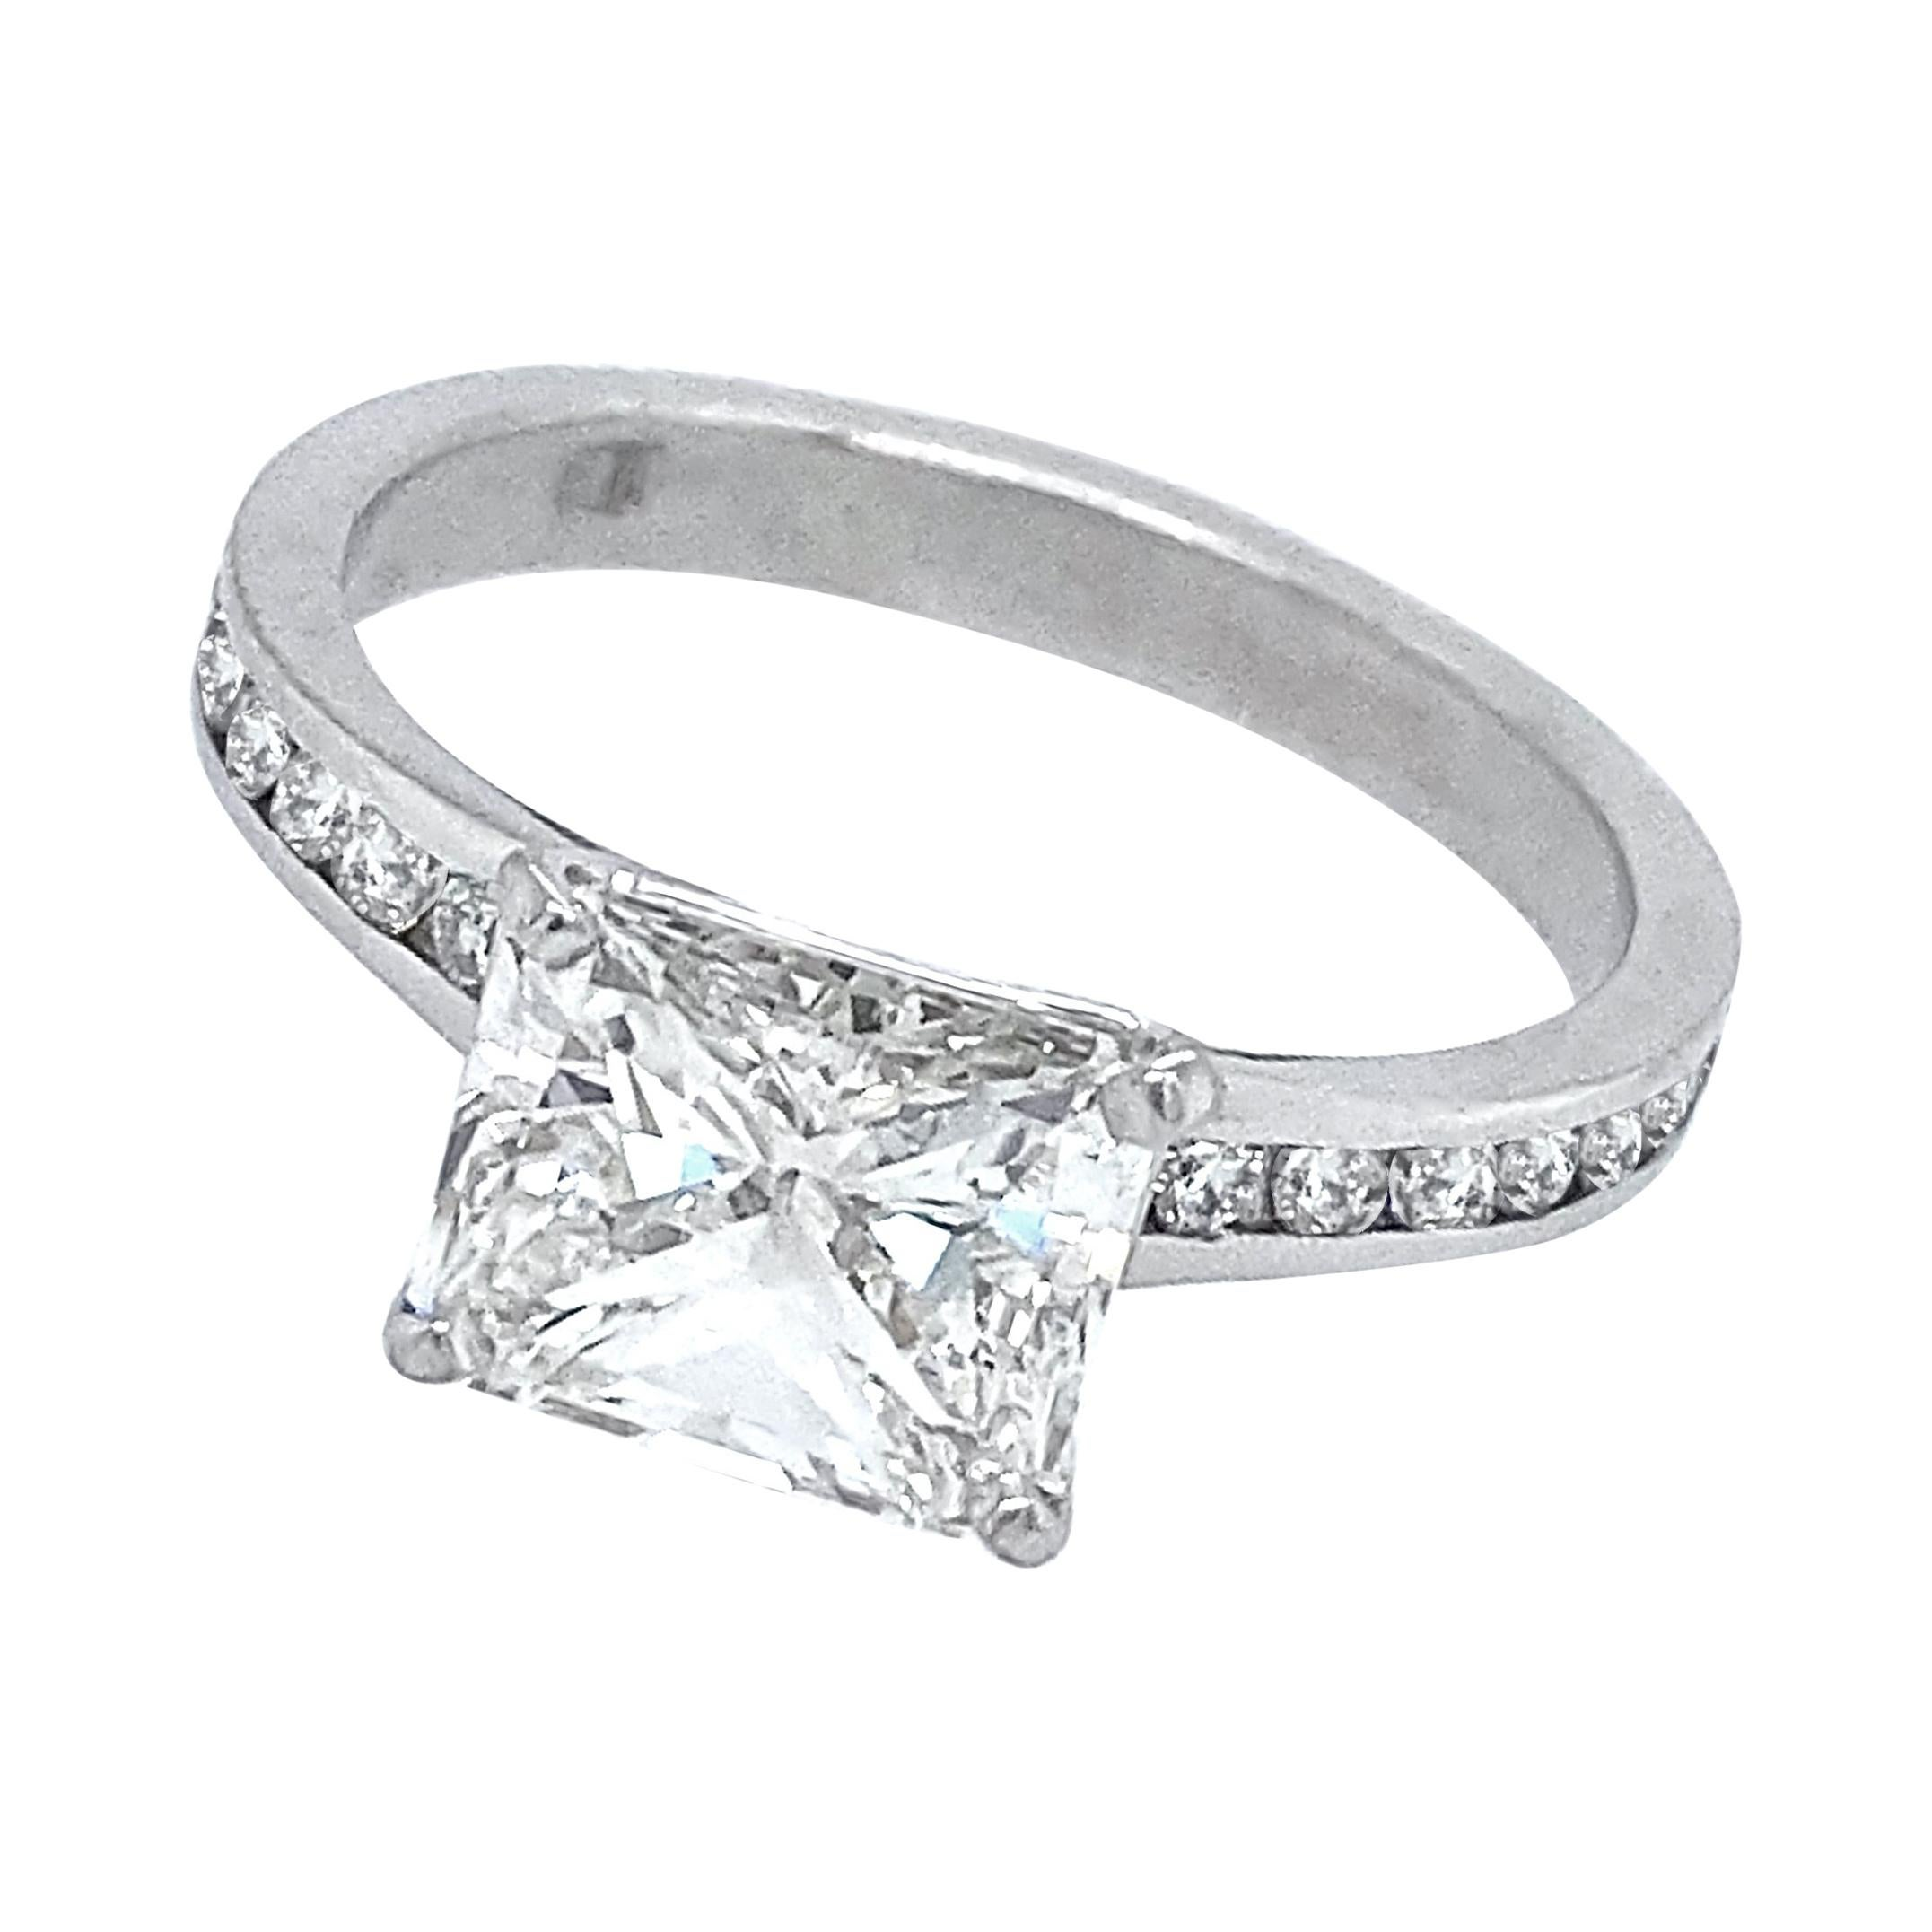 1.71 Carat GIA-Certified Radiant Diamond Engagement Ring in Platinum